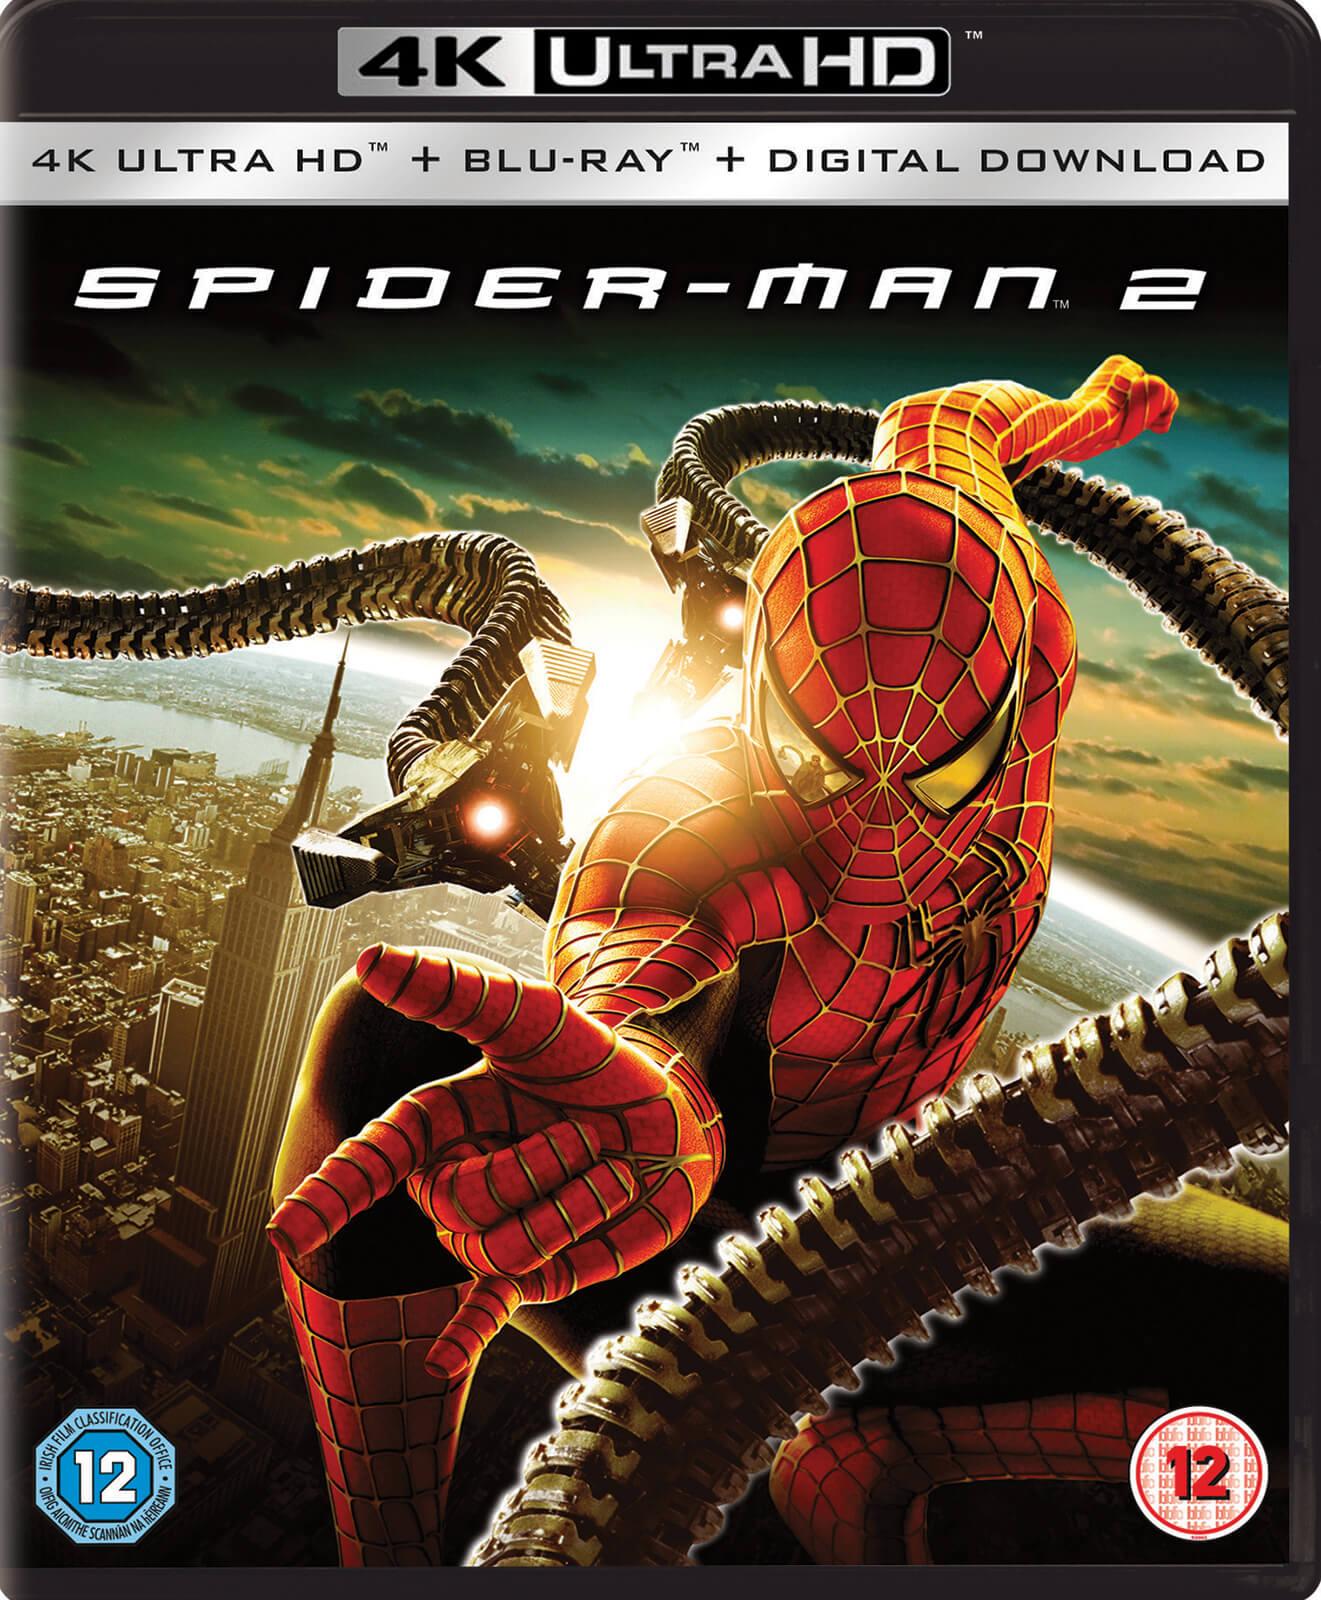 spider-man 2 (2004) - 4k ultra hd blu-ray | zavvi australia